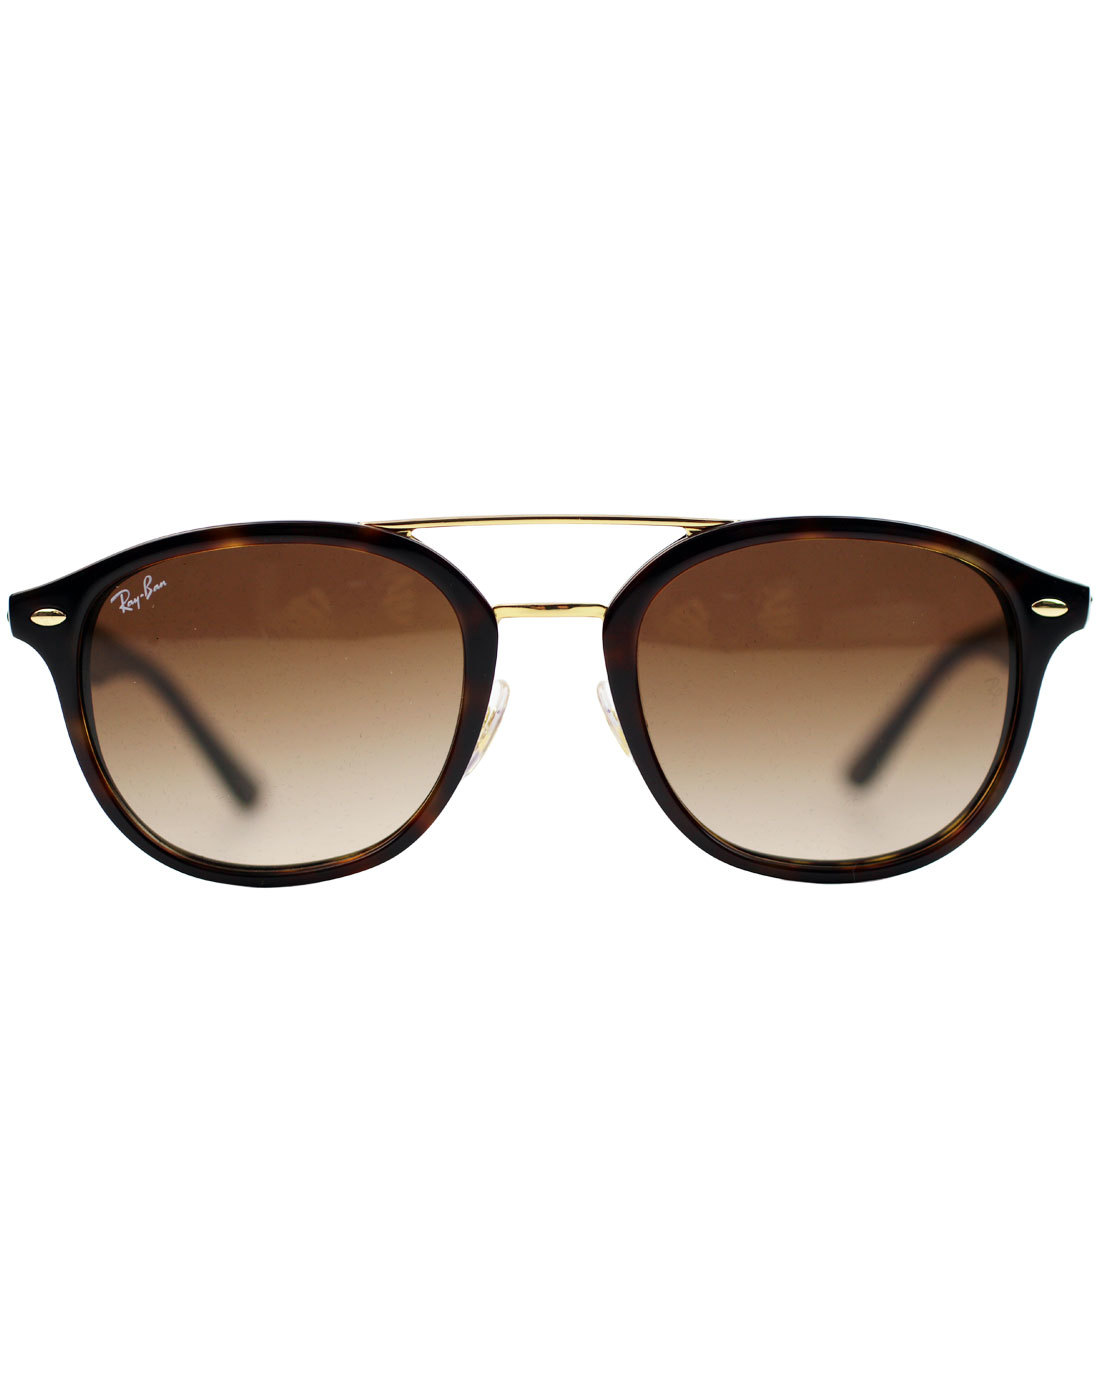 Ray-Ban Brow Bar Wayfarer Retro Sunglasses -Havana